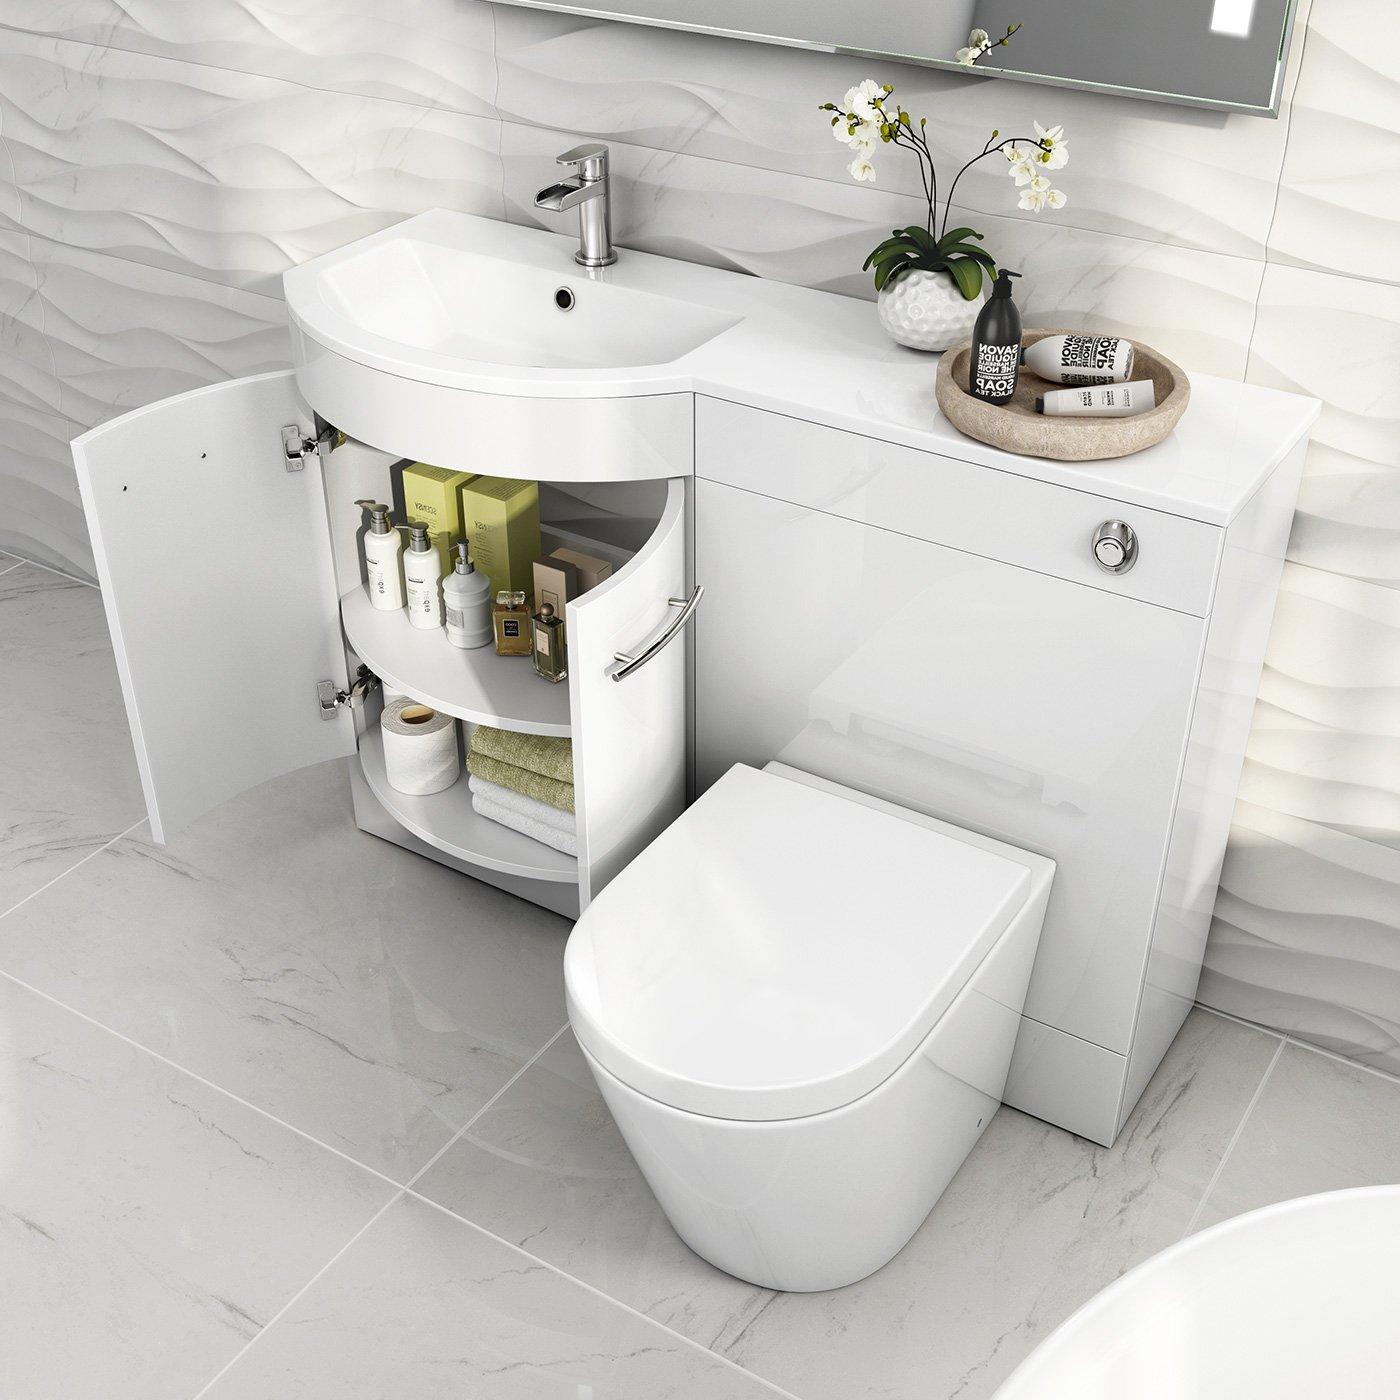 Enjoyable 1200 Mm White Vanity Unit Countertop Basin Toilet Bathroom Furniture Set Mv1610 Home Interior And Landscaping Transignezvosmurscom